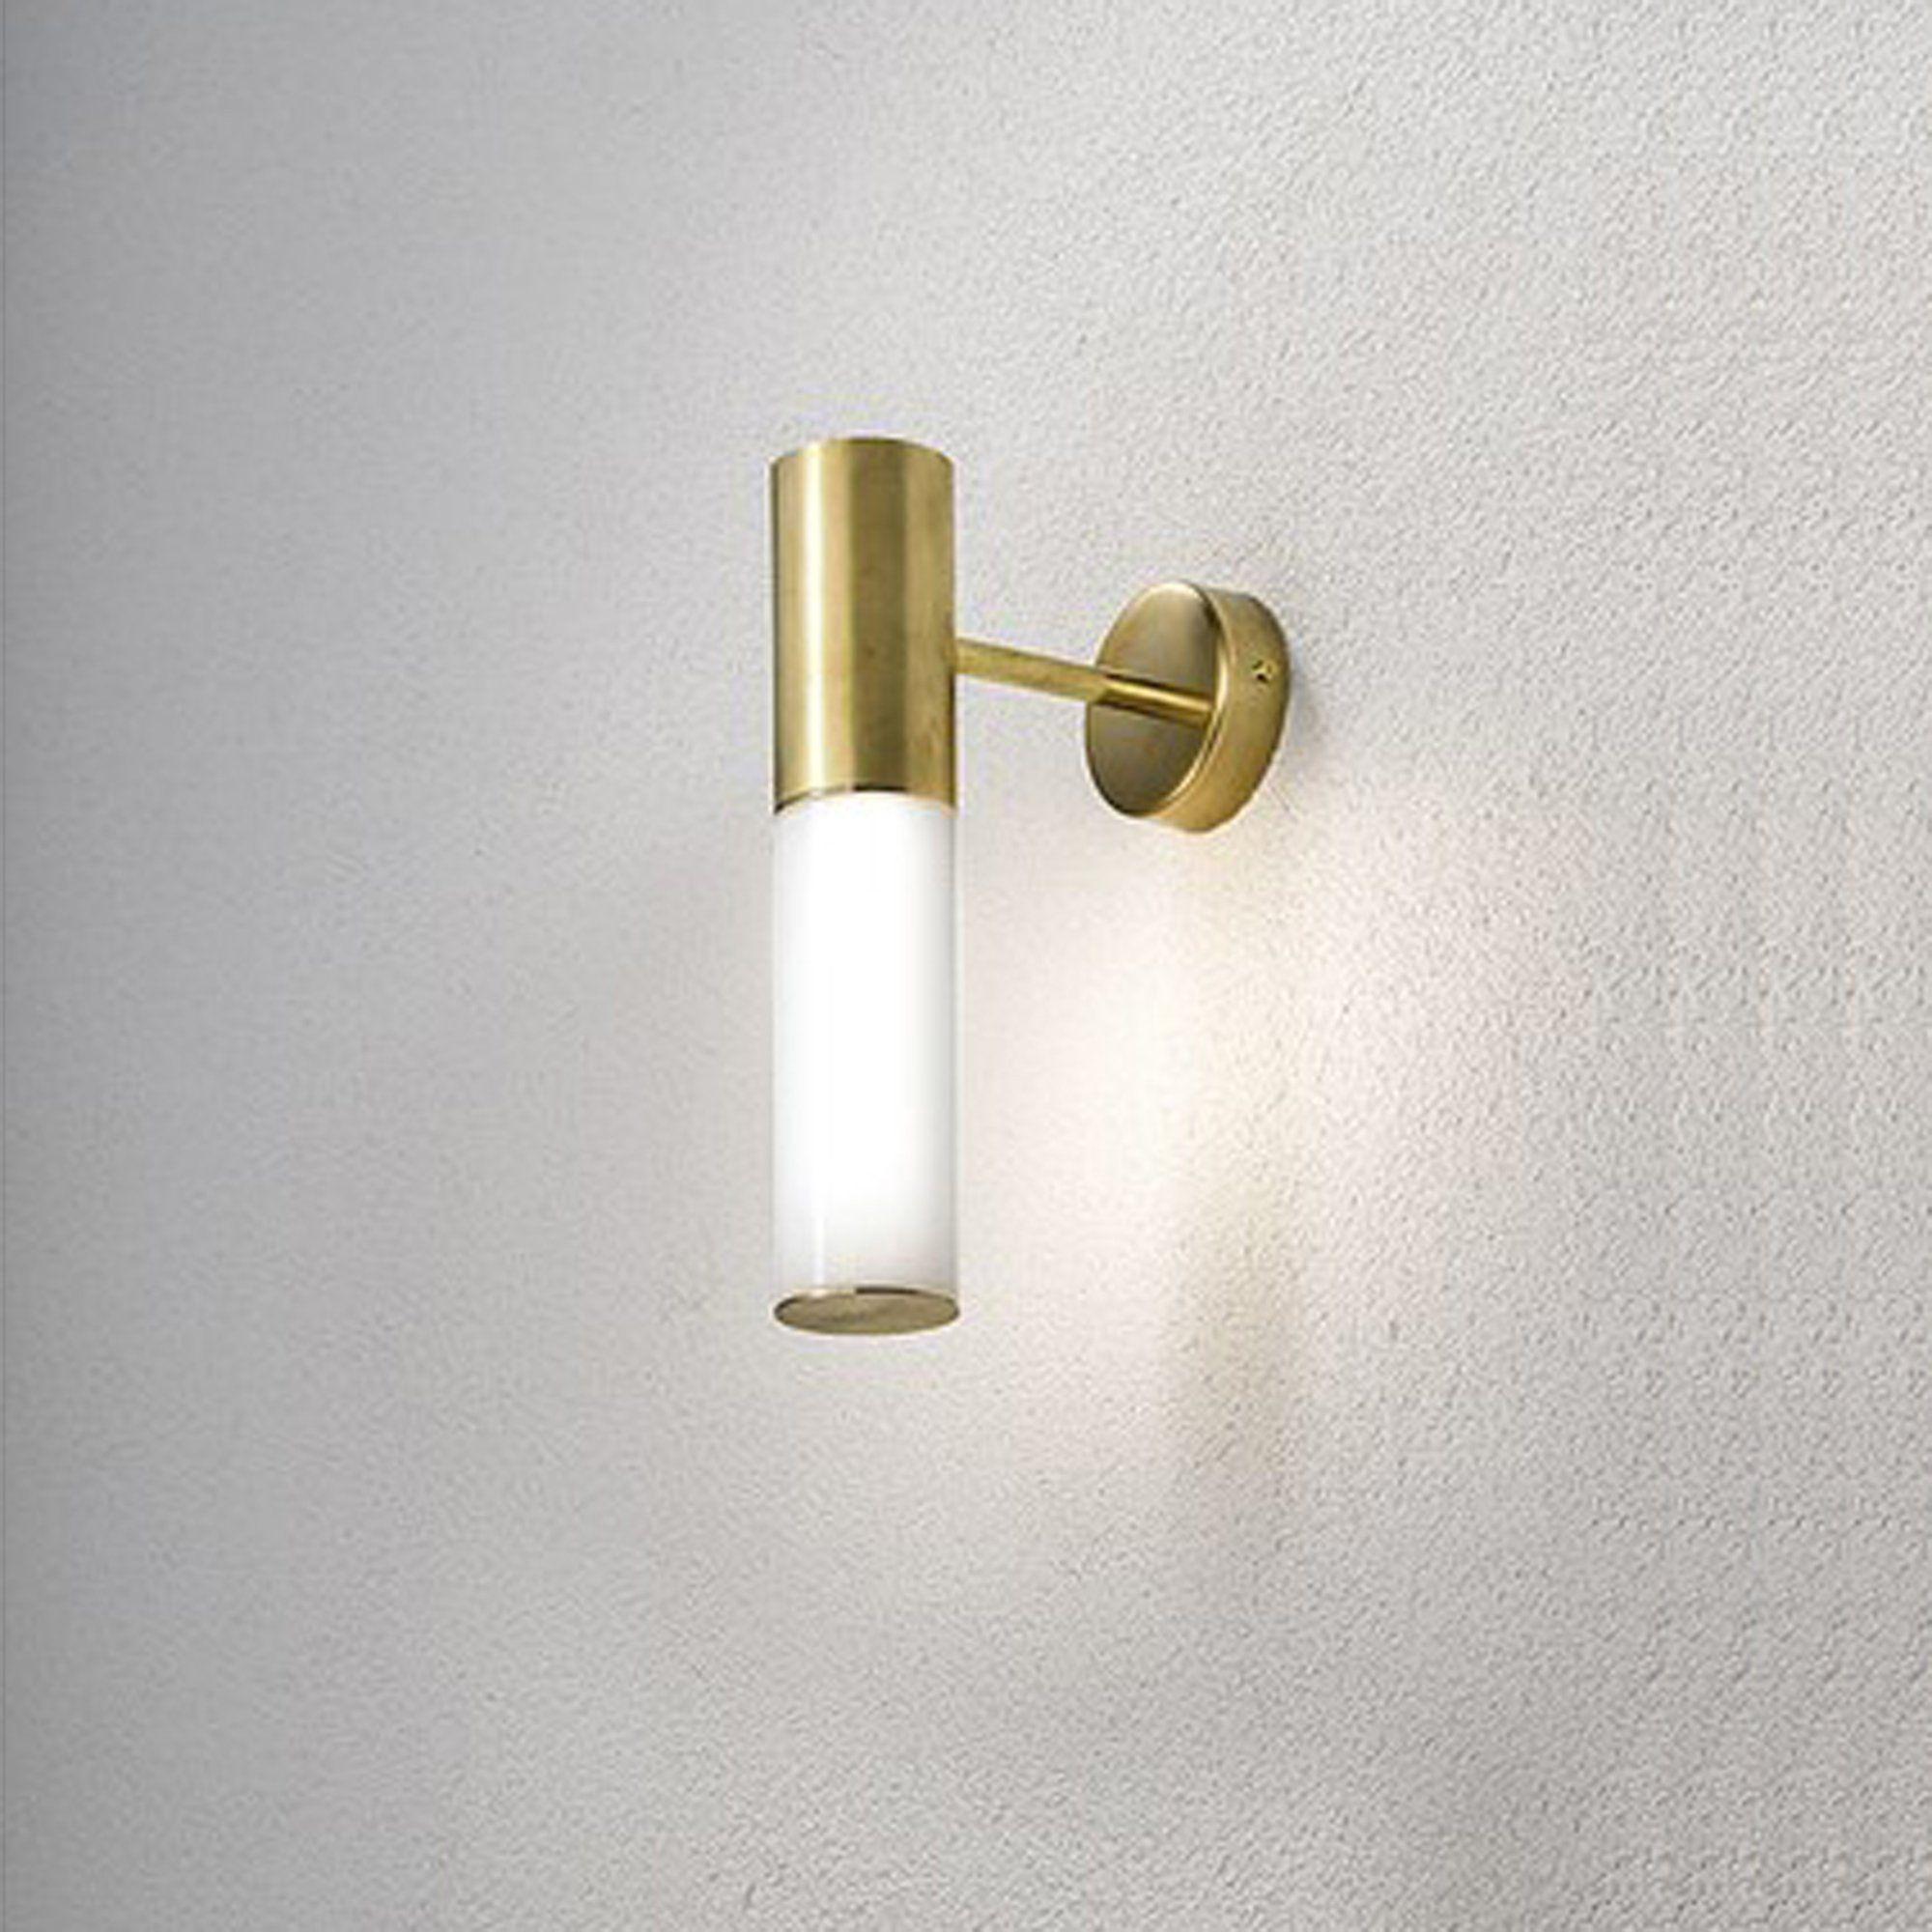 Etoile Wall Light Brass Wall Light Wall Lights Interior Wall